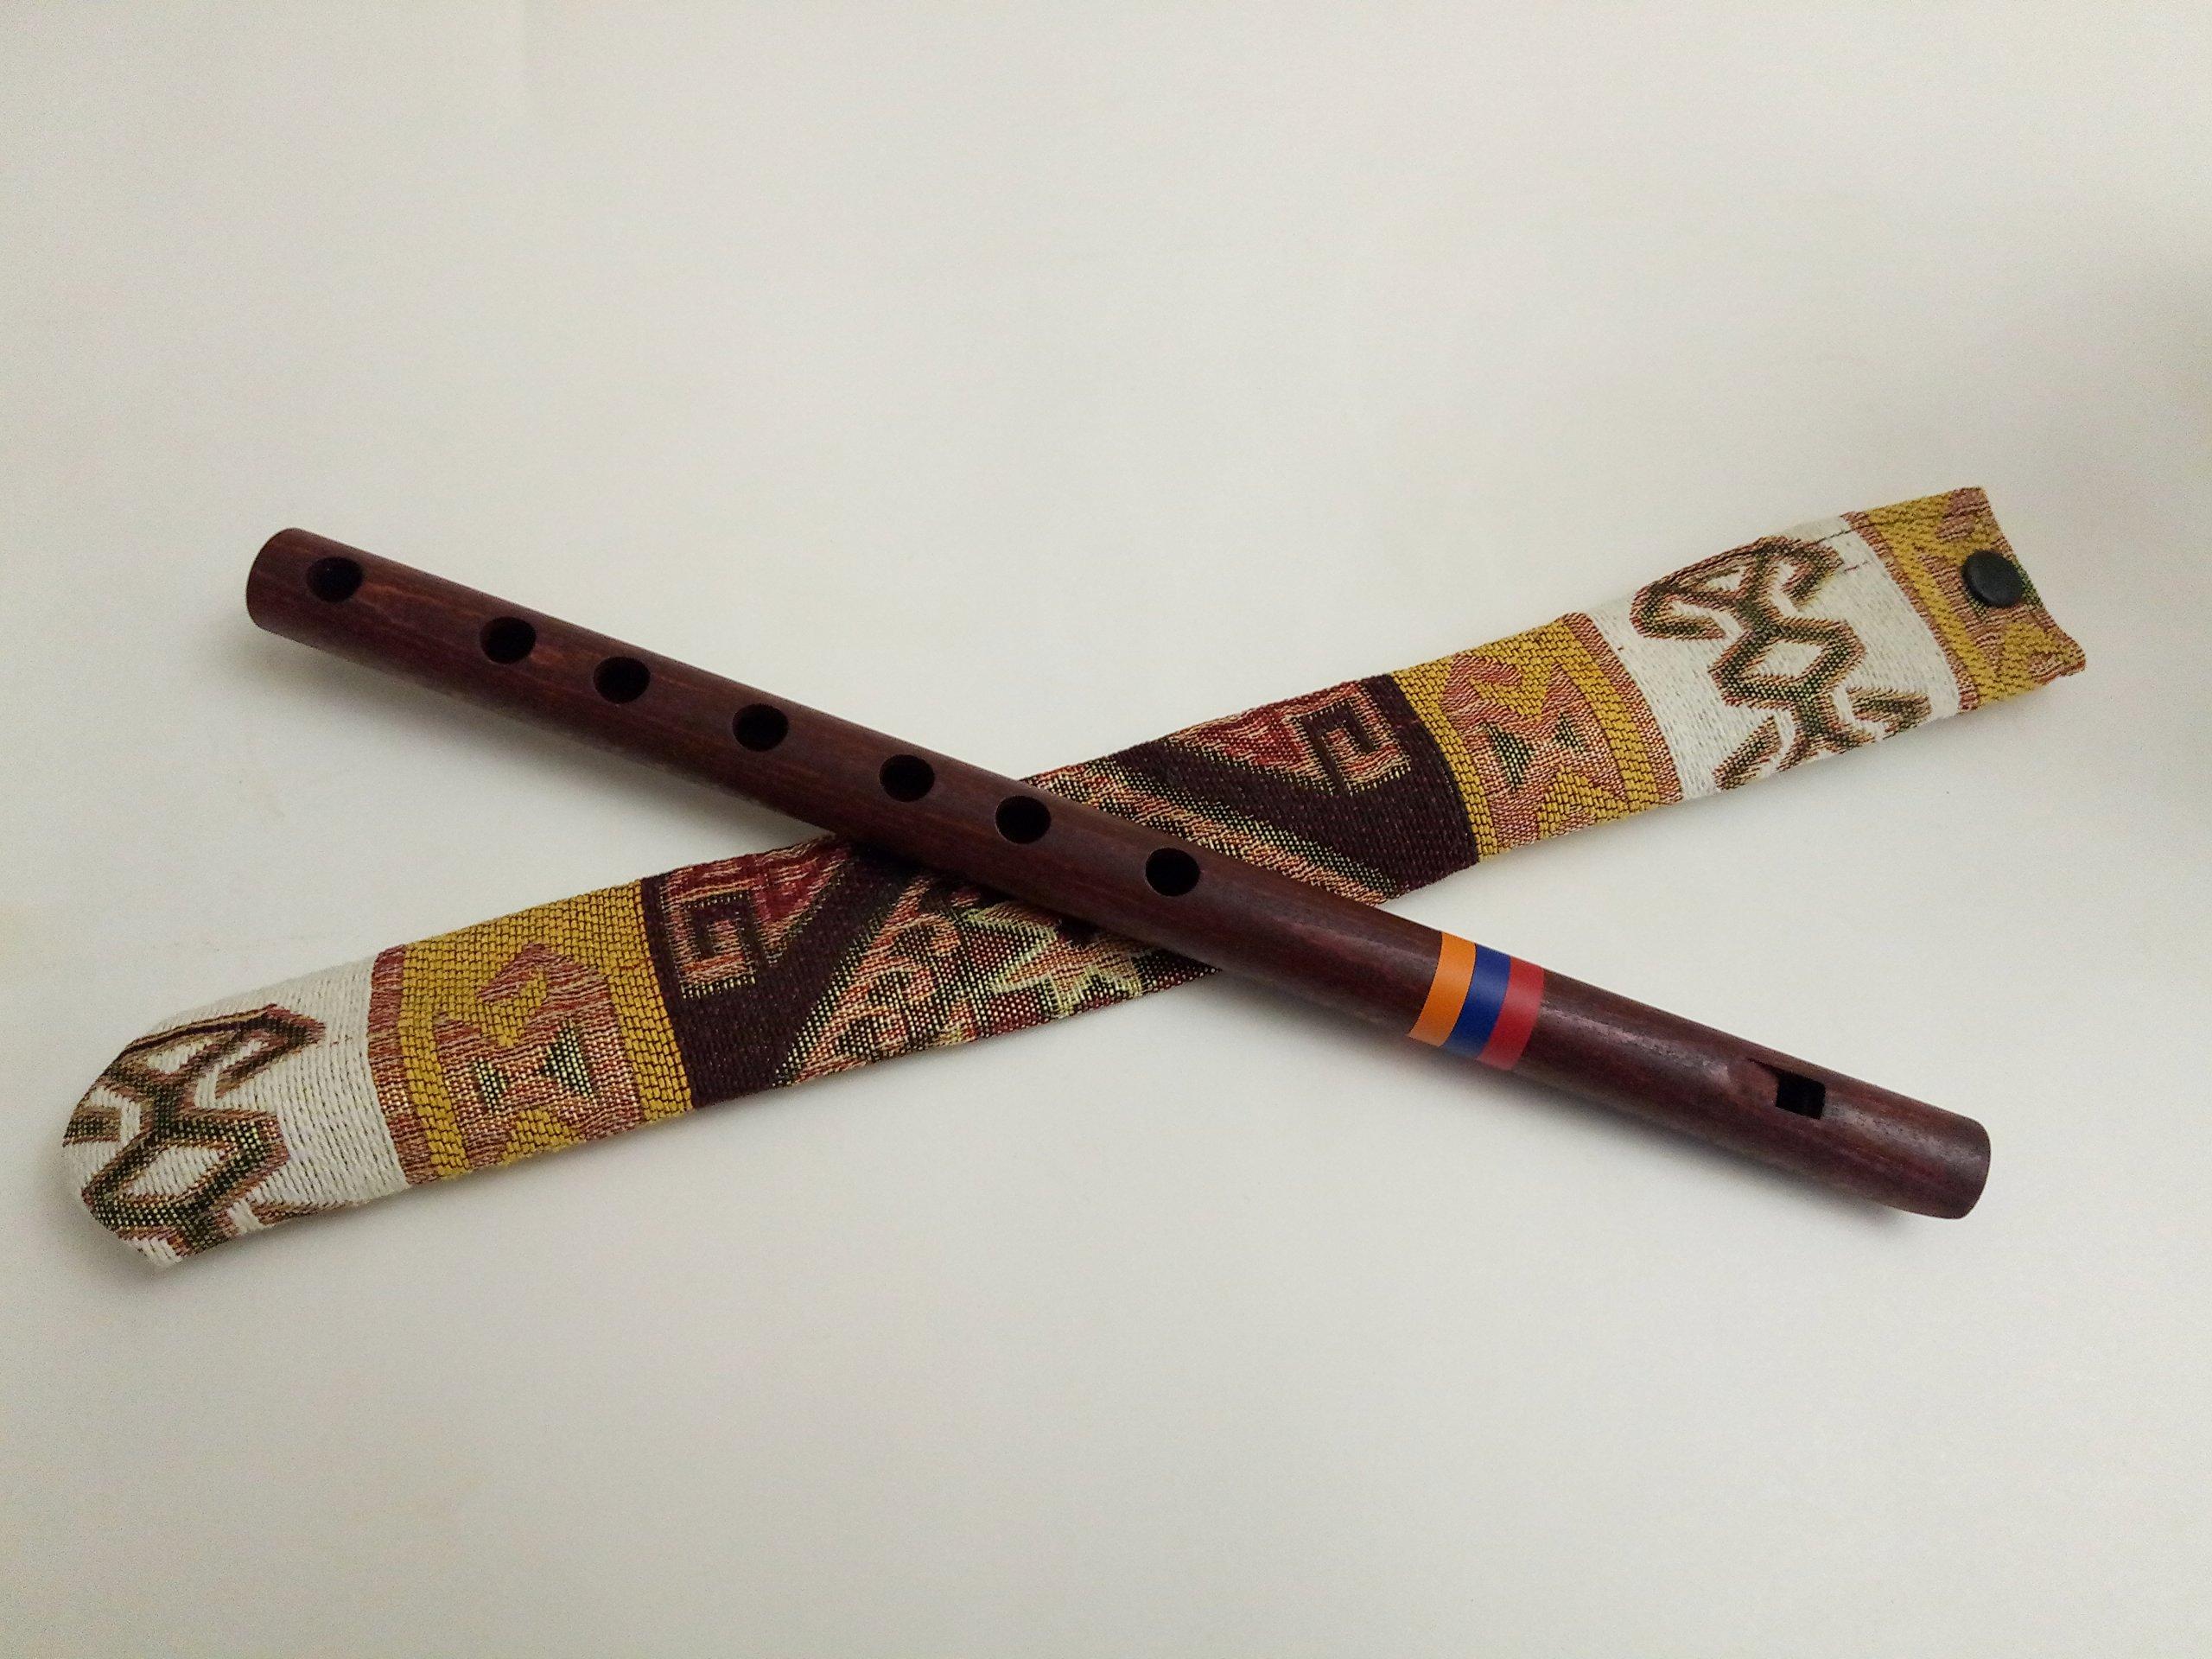 Flute Professional, Armenian Flute, Shvi, Apricot Wood, National Case, Armenian Duduk